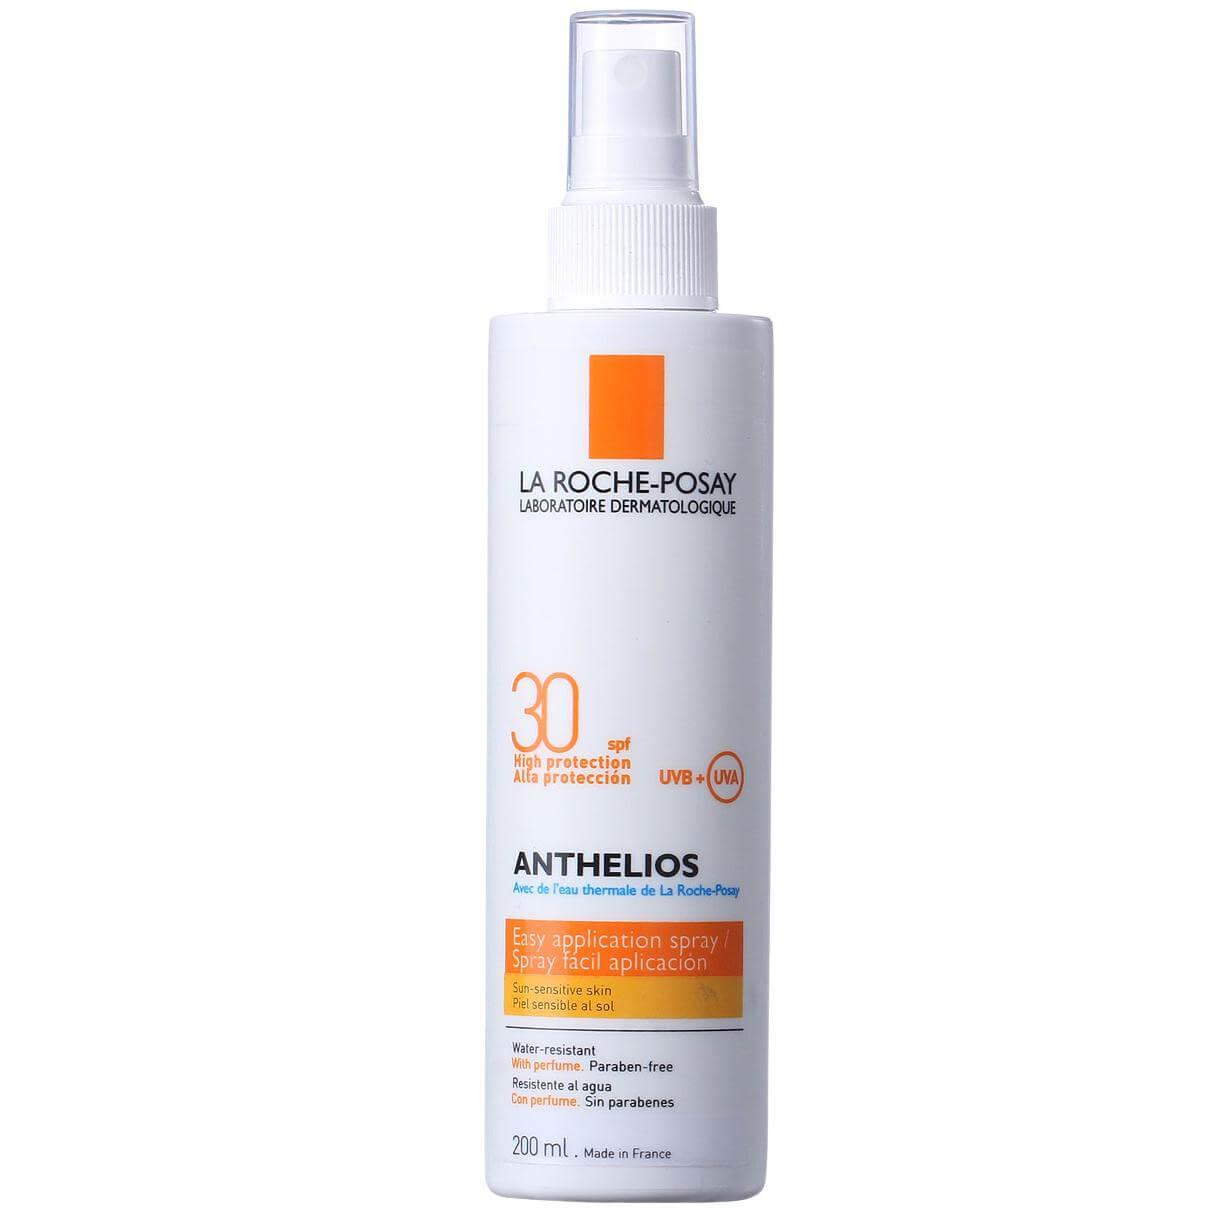 La Roche-Posay Anthelios Spray Spf30 Σπρέϋ Υψηλής Αντηλιακής Προστασίας Για Το Σώμα Χωρίς Άρωμα 200ml